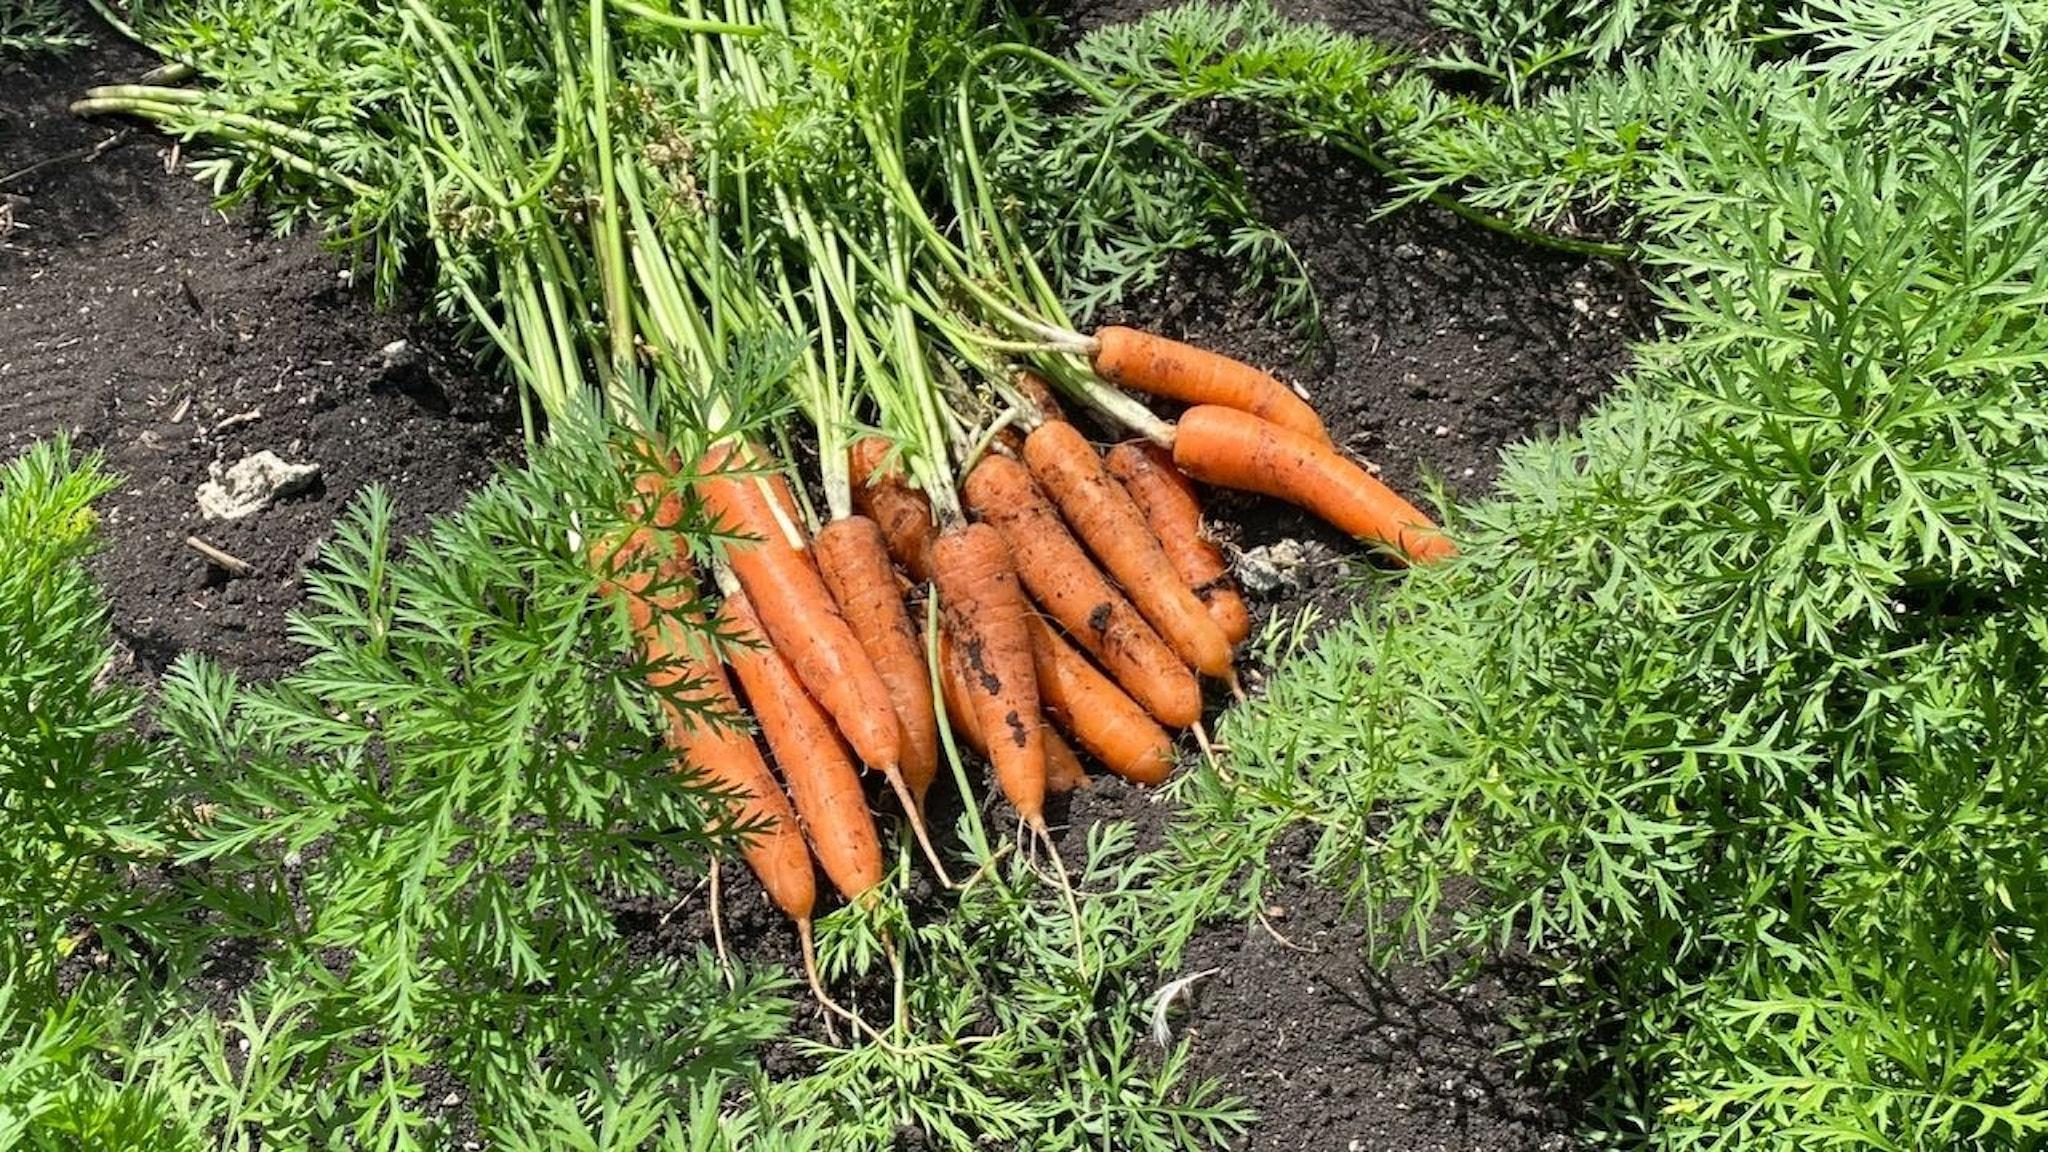 Nyplockade morötter. Sorten heter Romance.